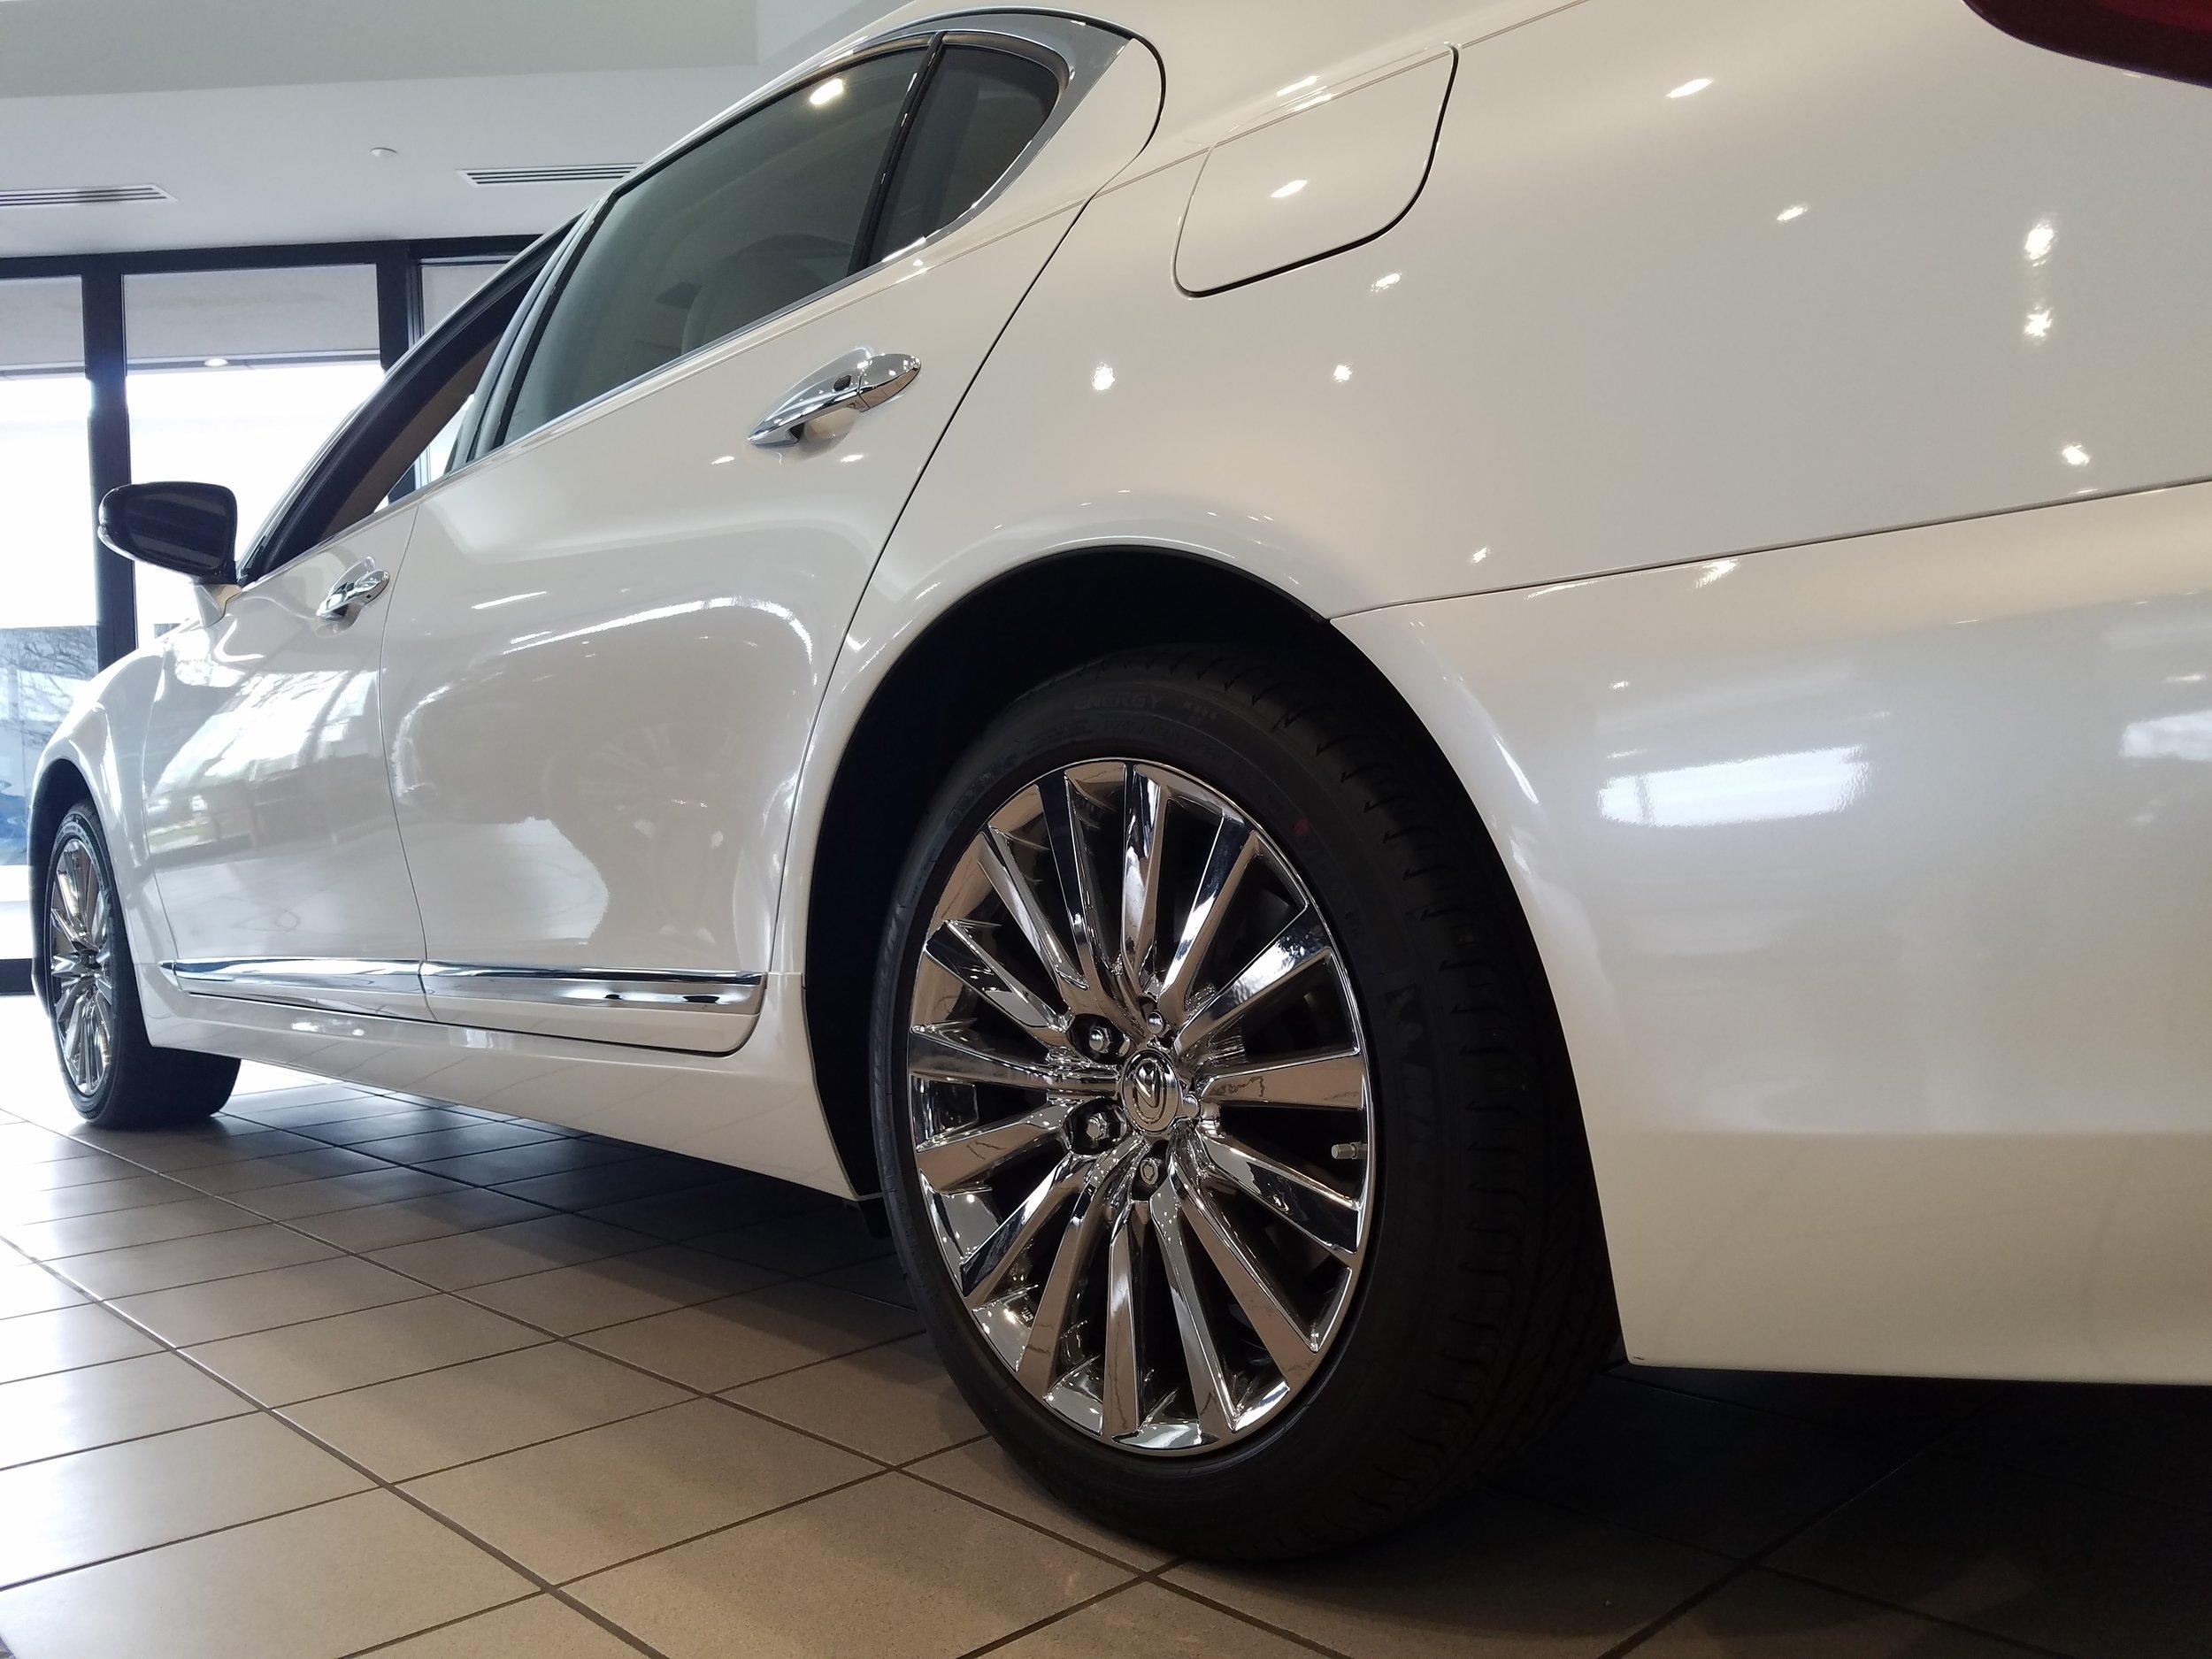 white-ls-460-bright-ice-wheels-3_25350334299_o.jpg